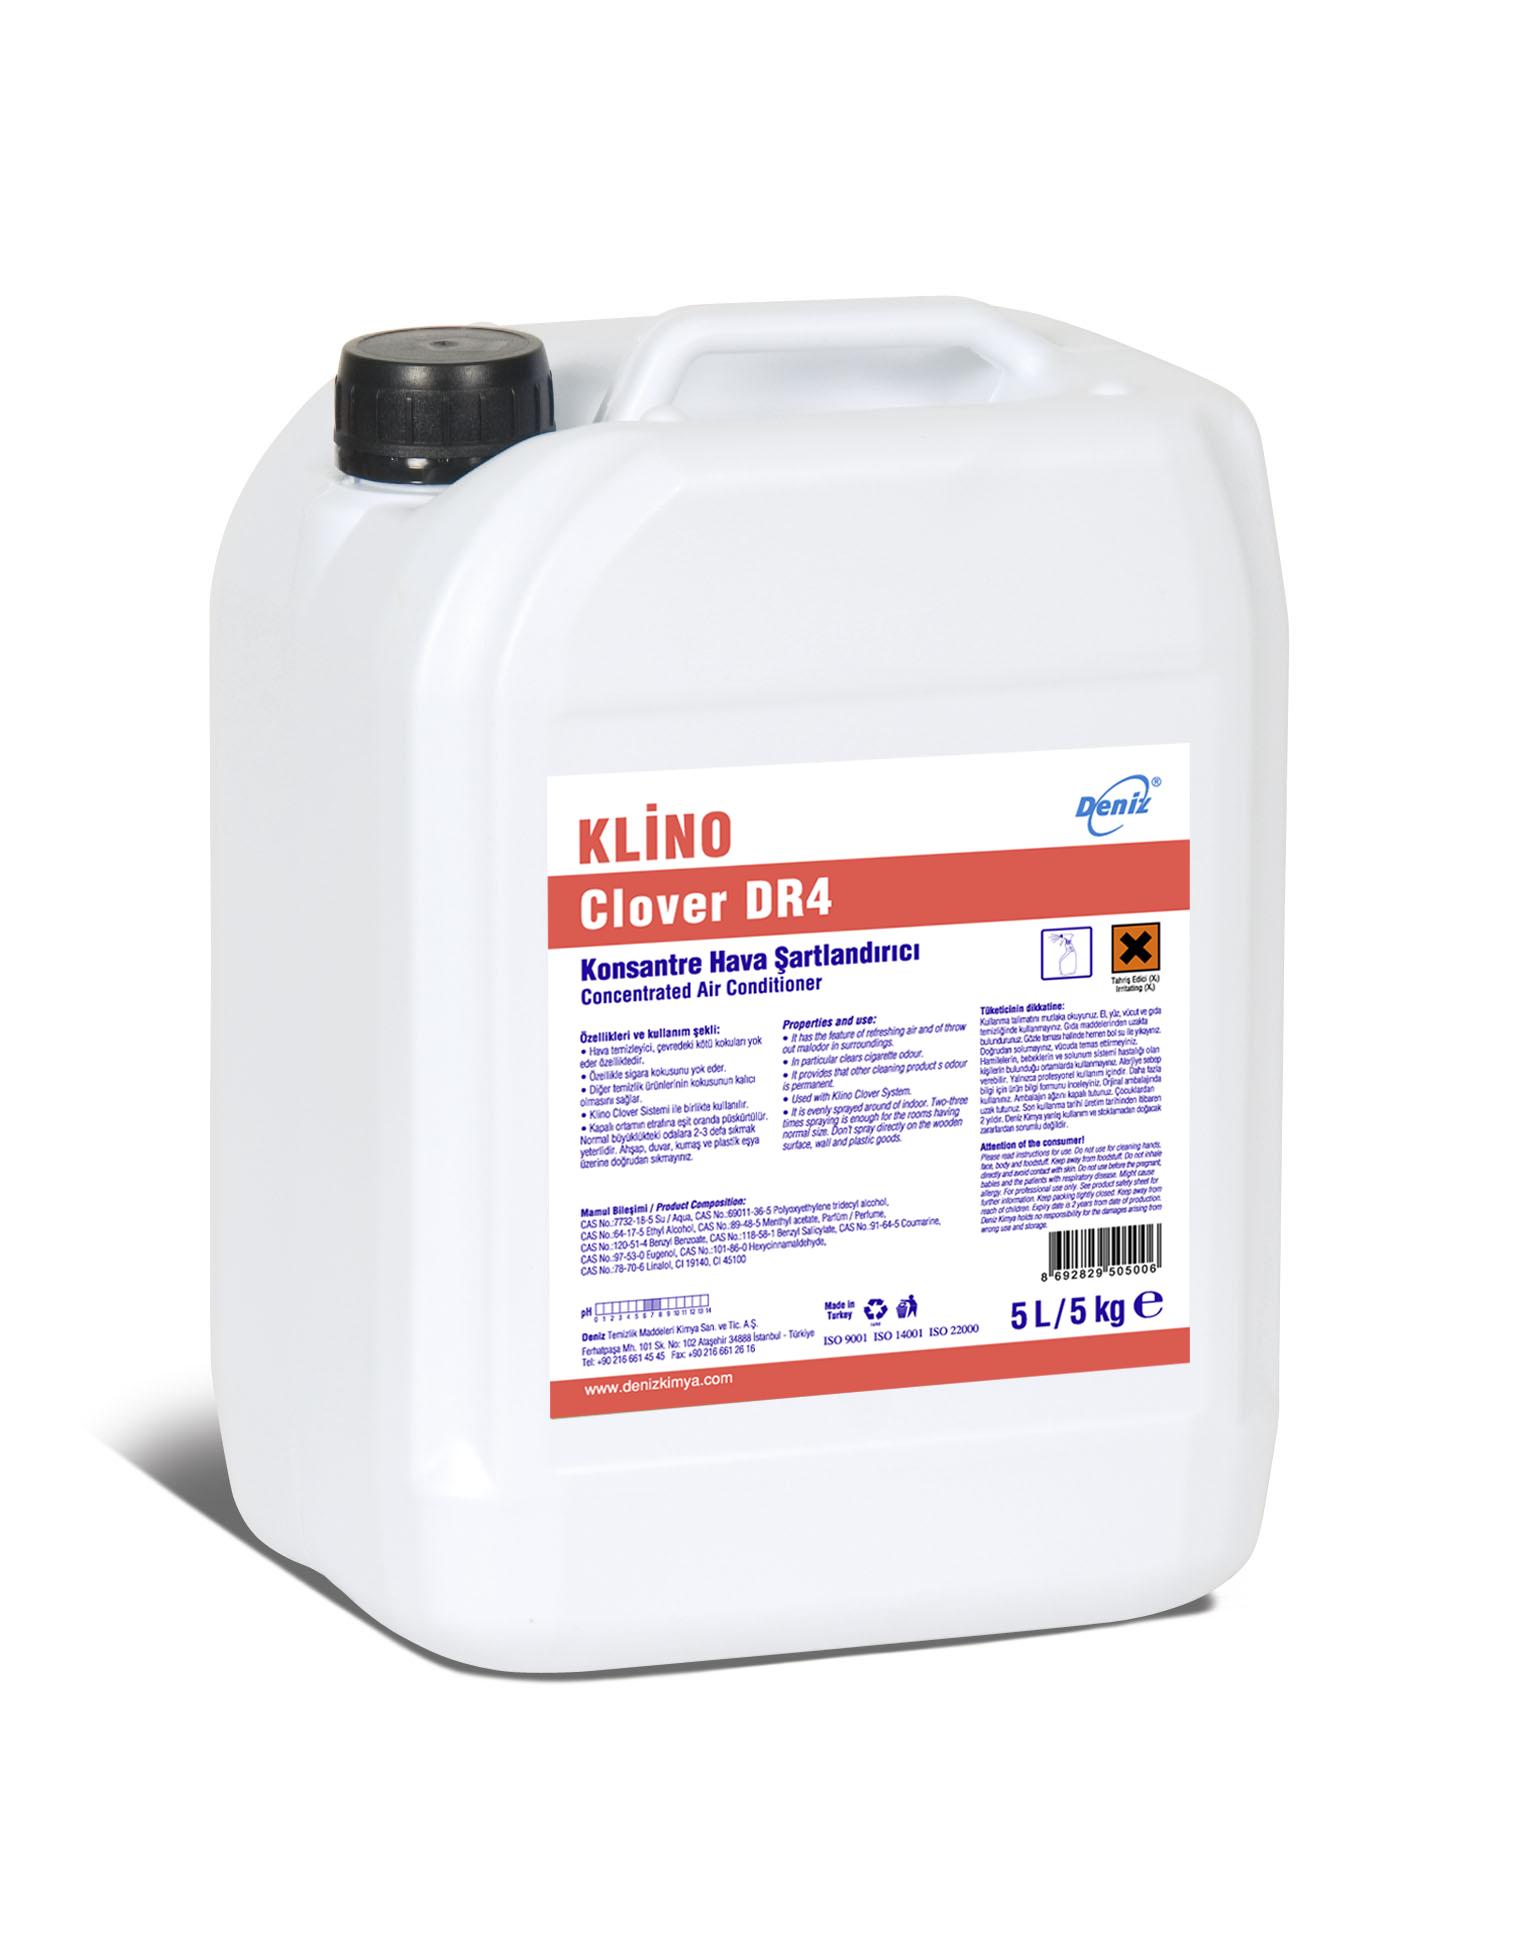 Klino DK4